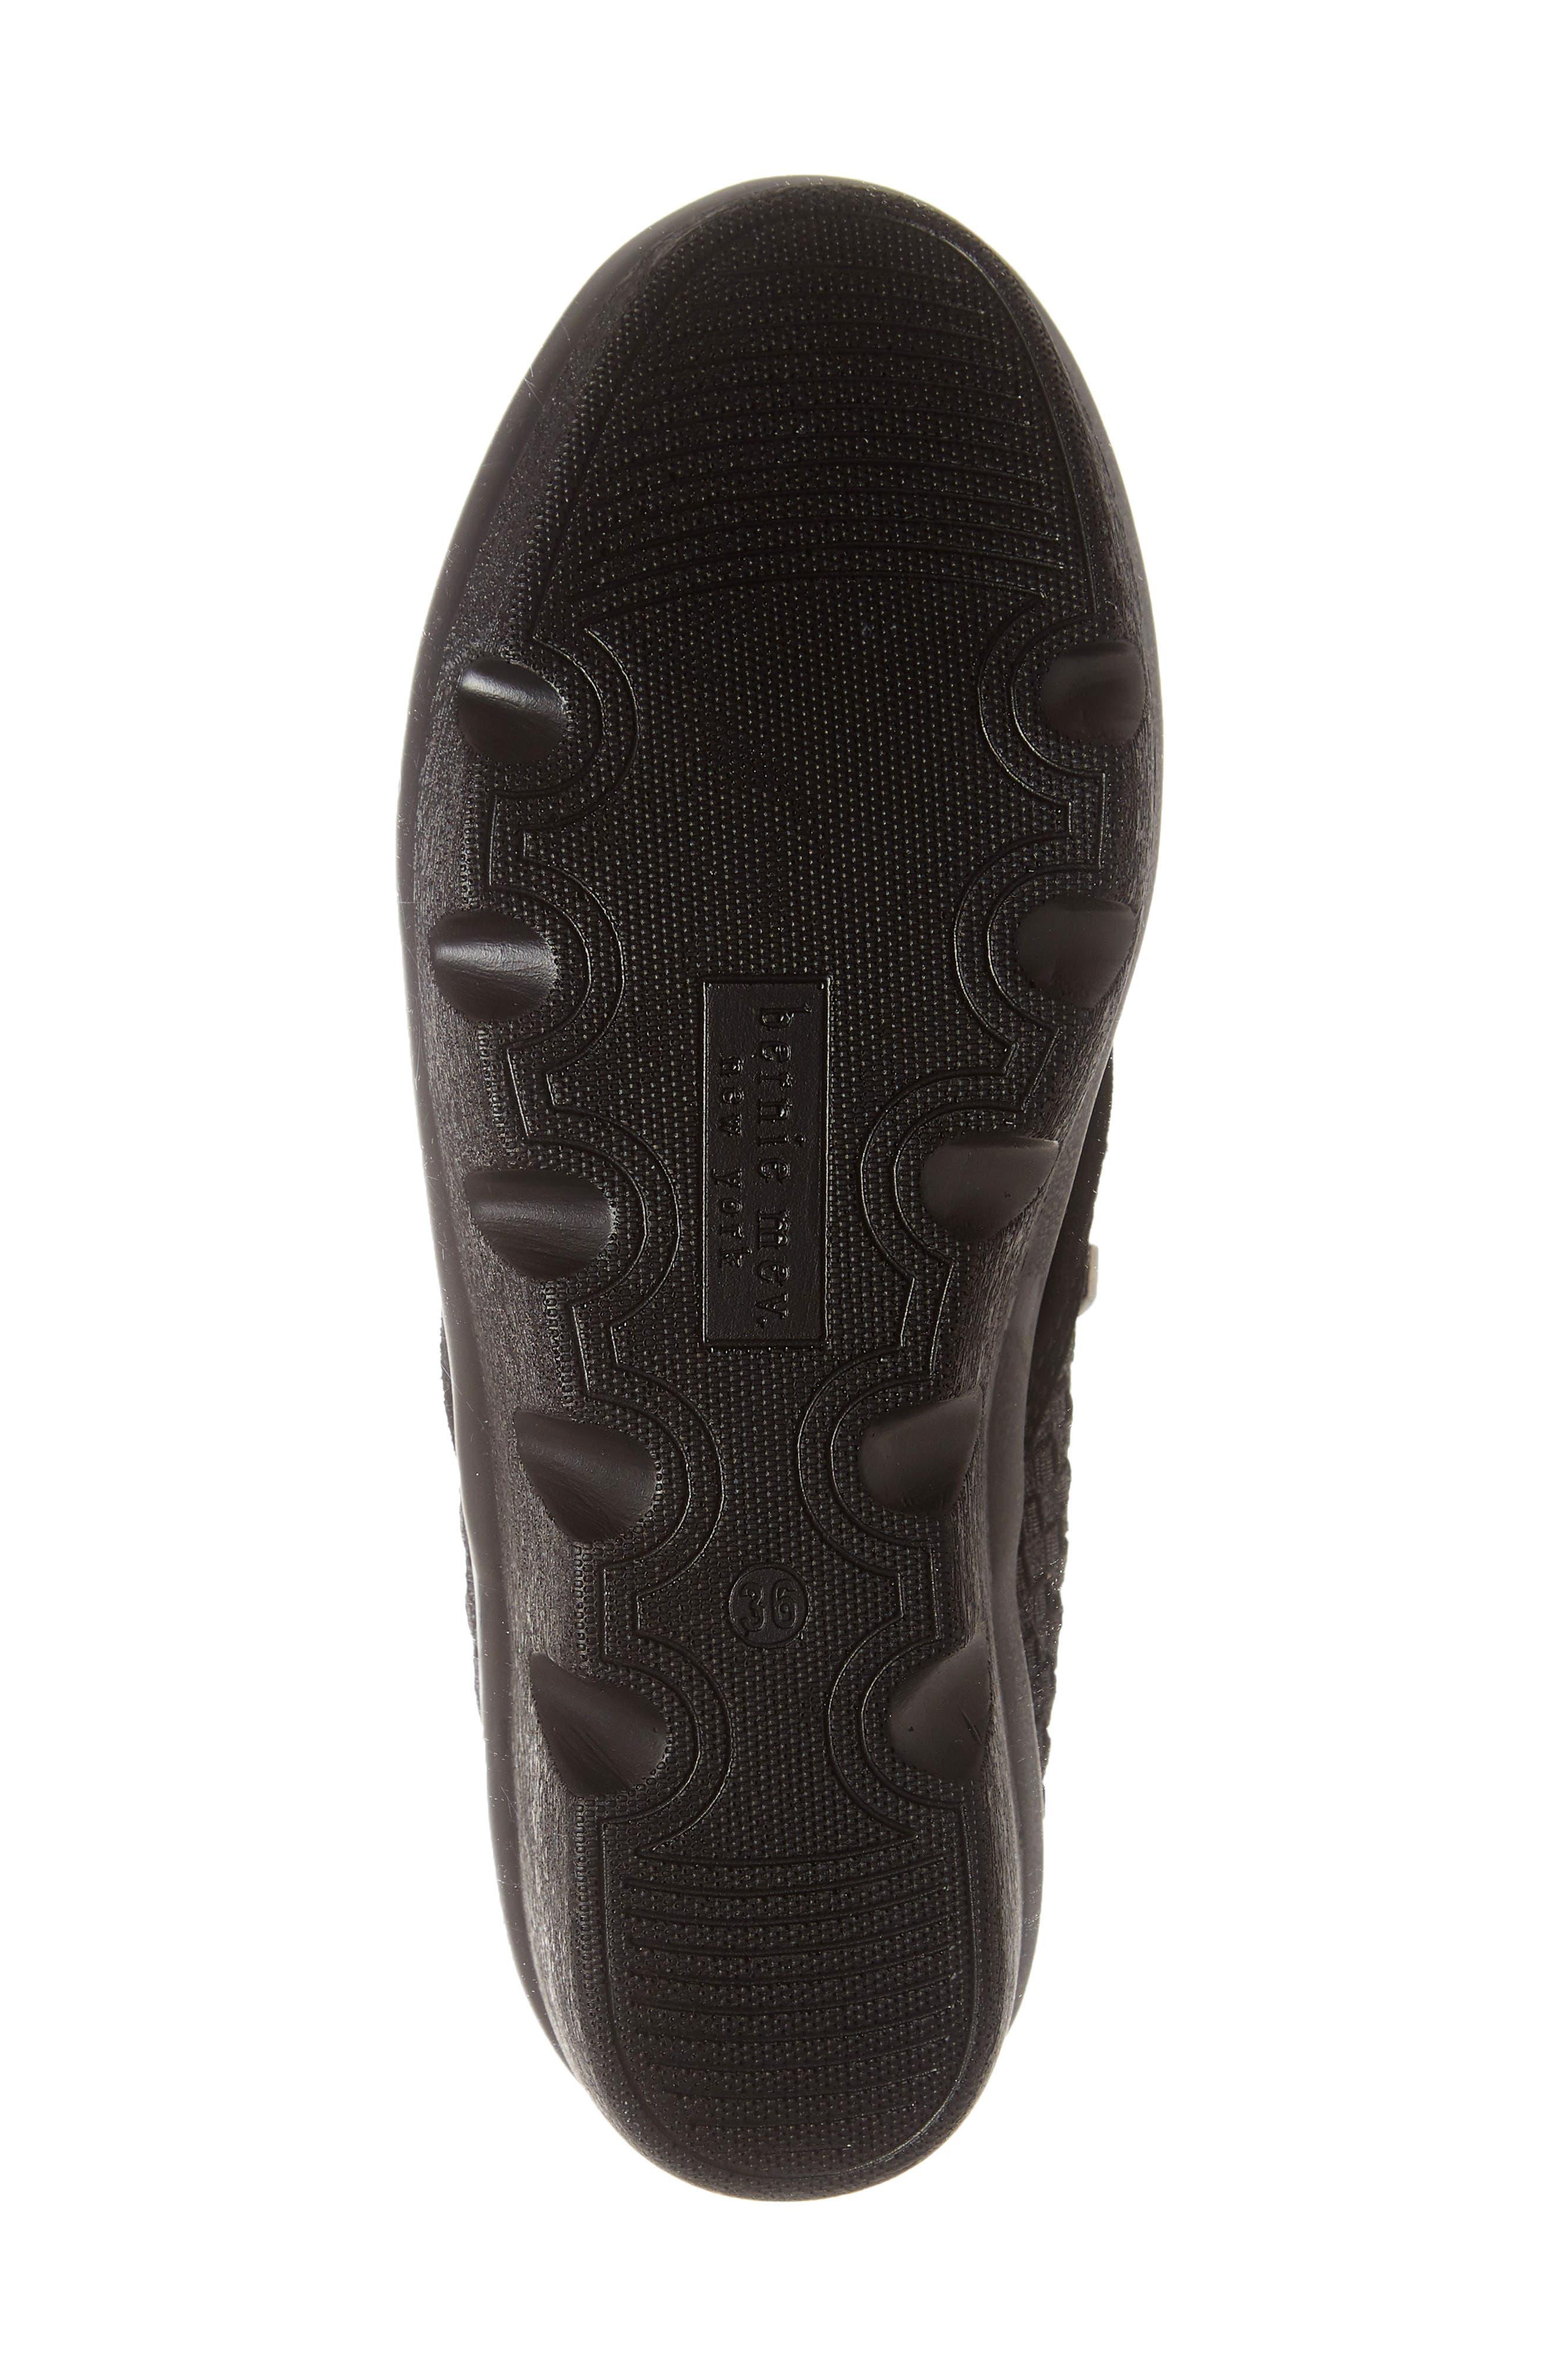 Lihi Ankle Boot,                             Alternate thumbnail 6, color,                             BLACK METALLIC LEATHER